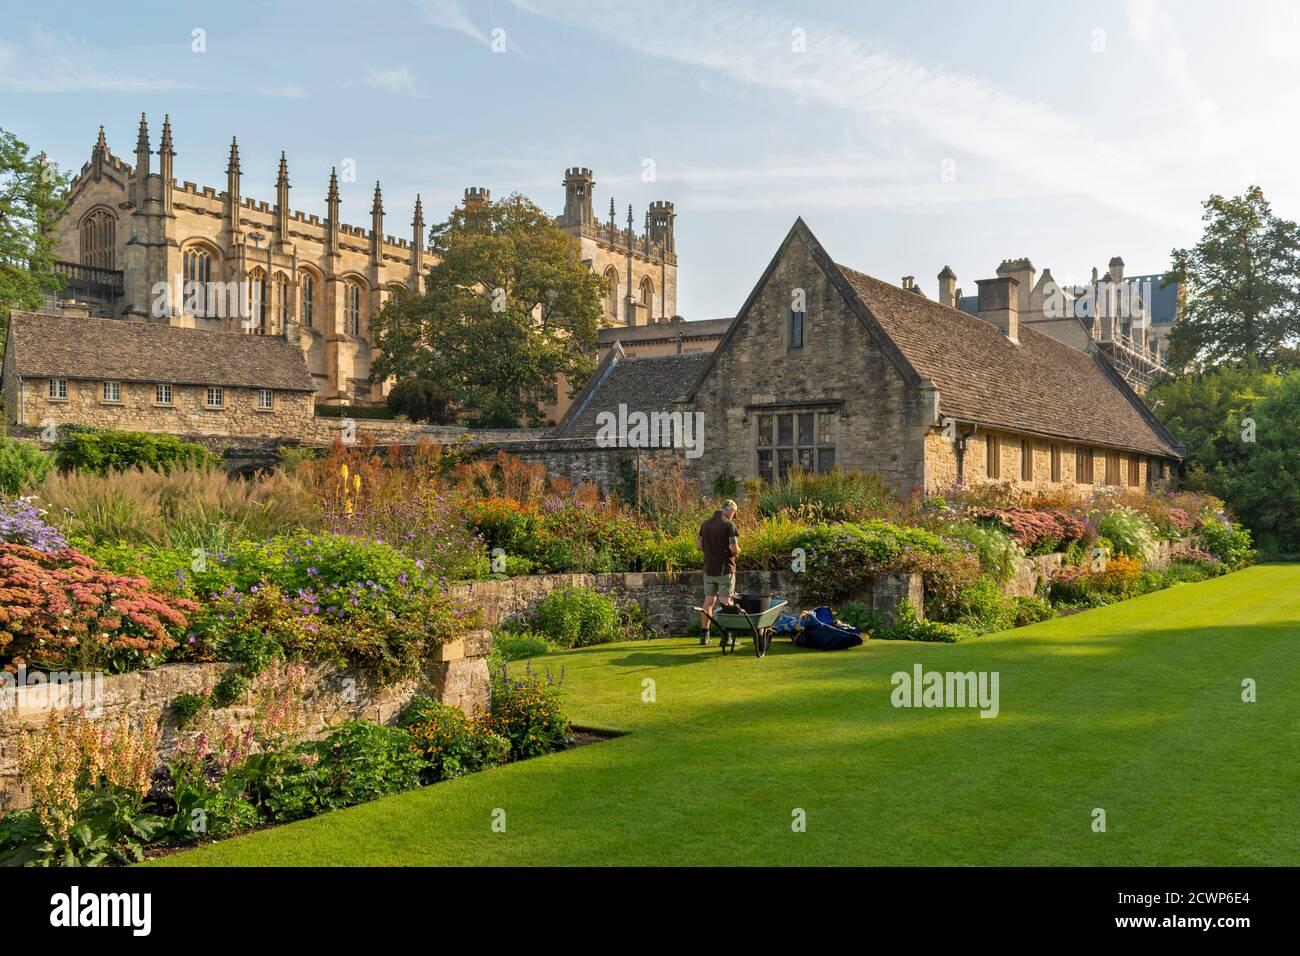 OXFORD CITY ENGLAND GARDENER AT WORK IN THE MEMORIAL GARDEN CHRIST CHURCH COLLEGE Stock Photo